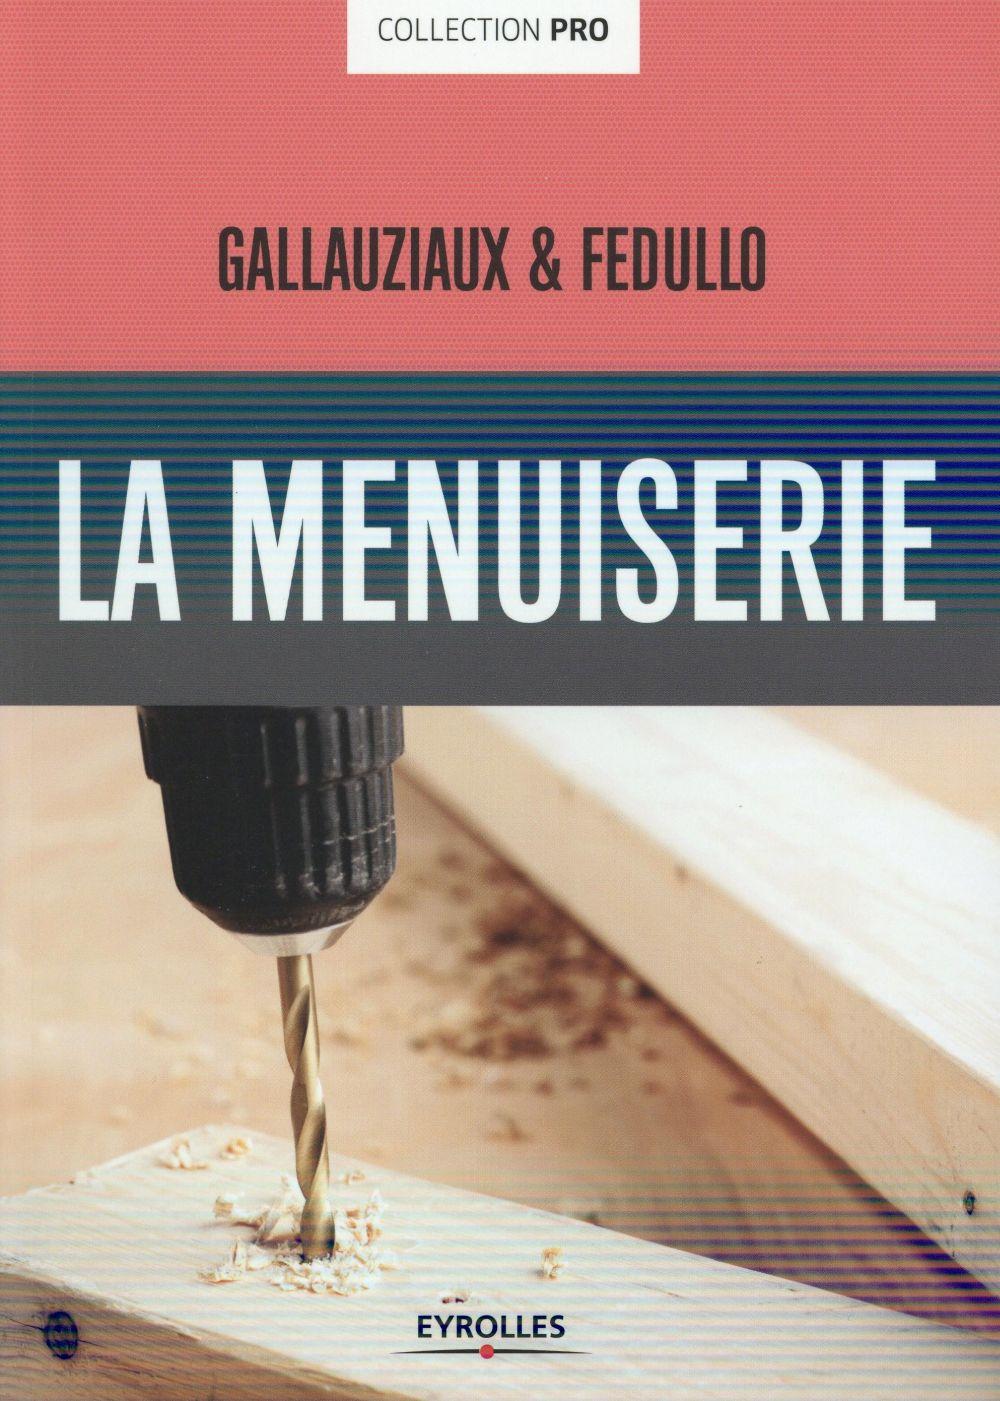 LA MENUISERIE GALLAUZIAUX / FEDULLO Eyrolles